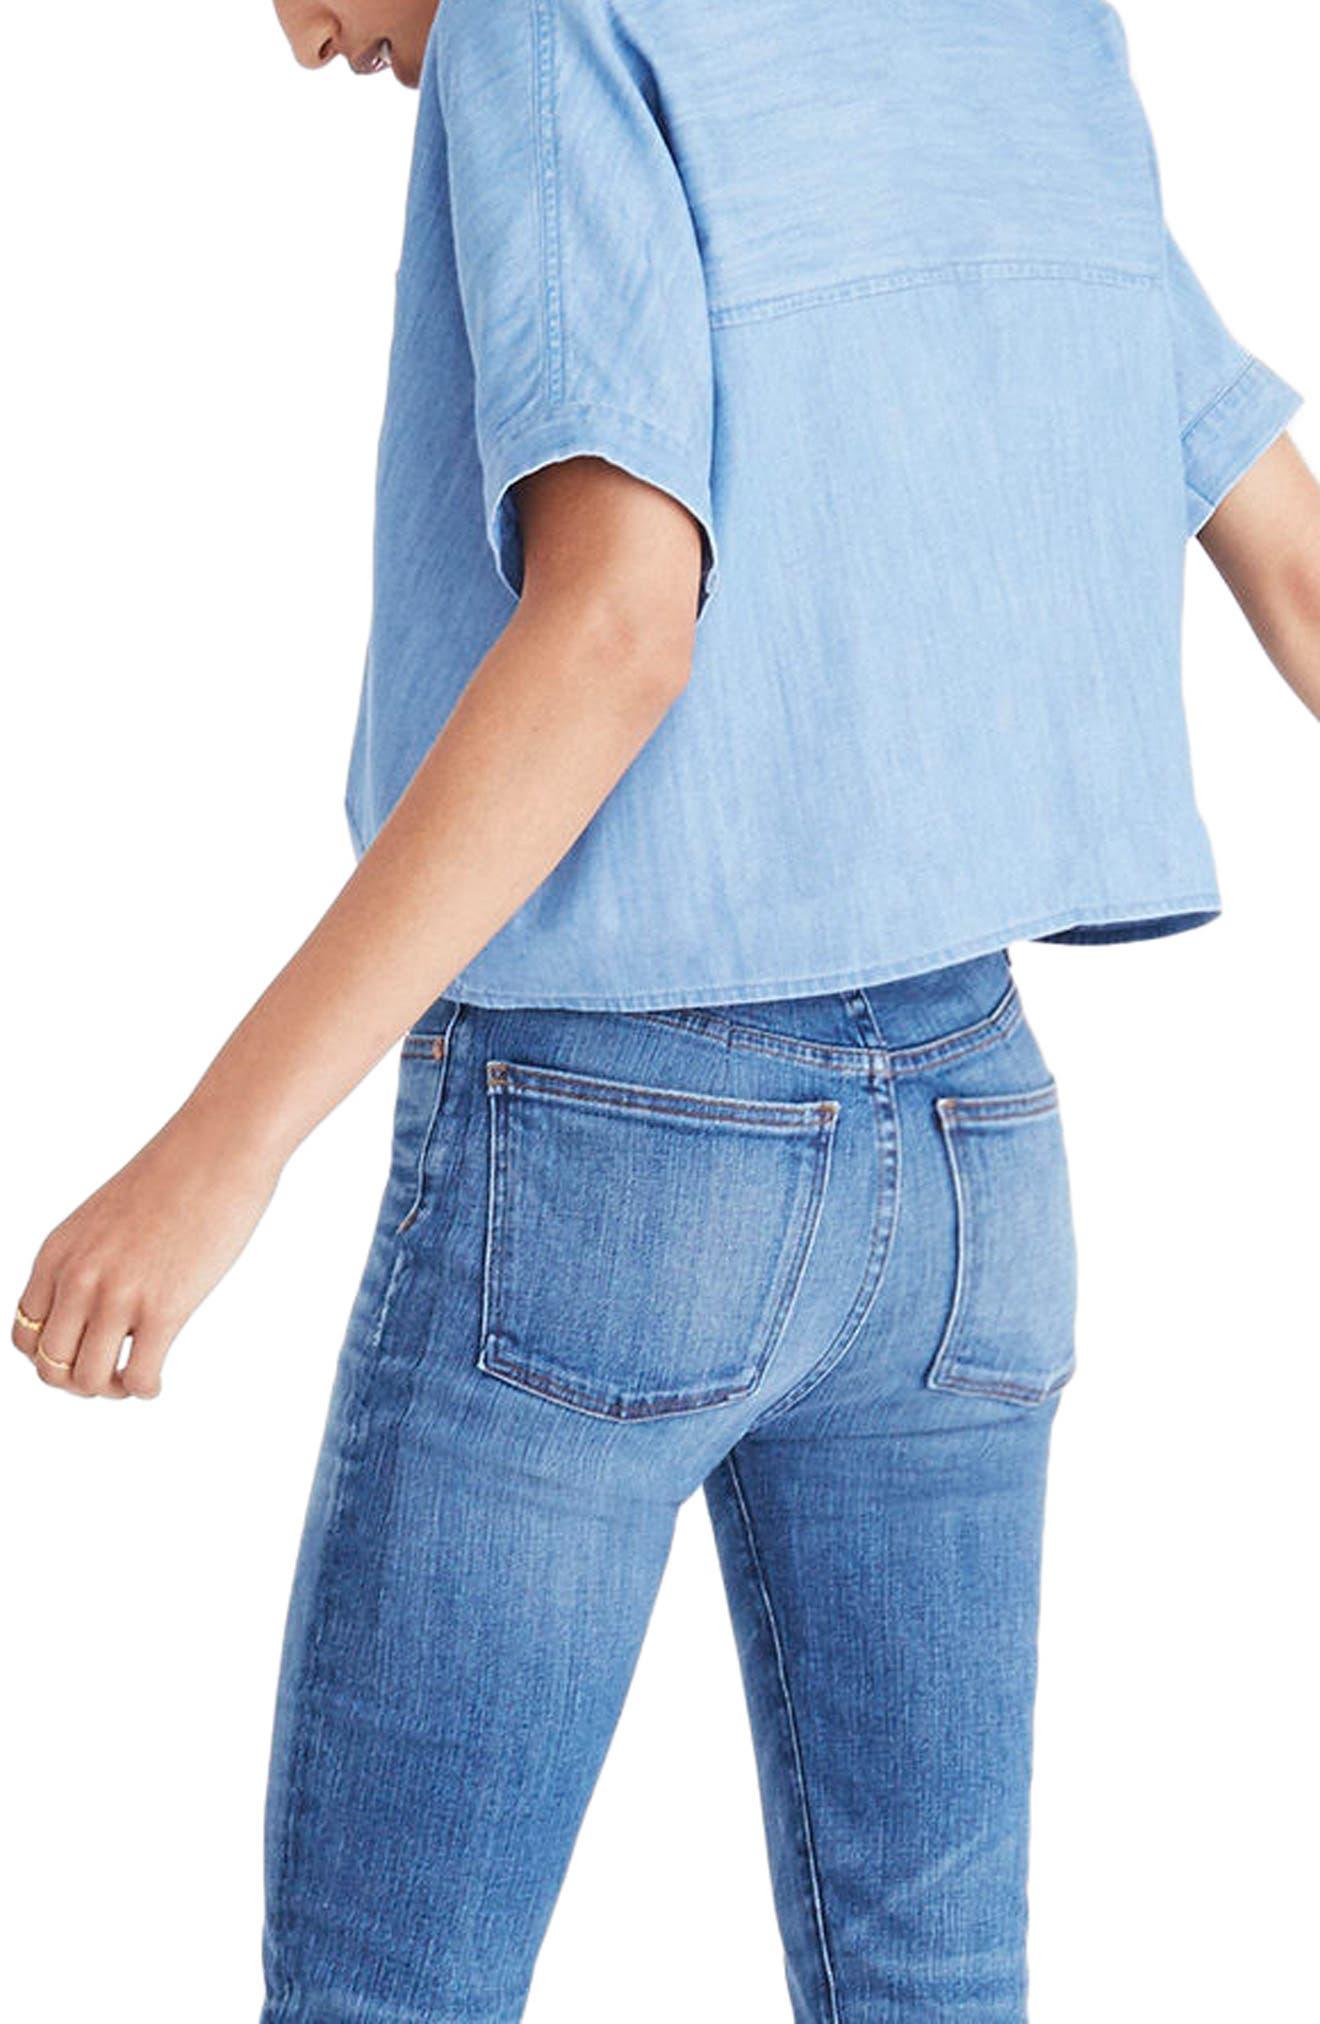 MADEWELL,                             Tie Front Short Sleeve Denim Shirt,                             Alternate thumbnail 2, color,                             400